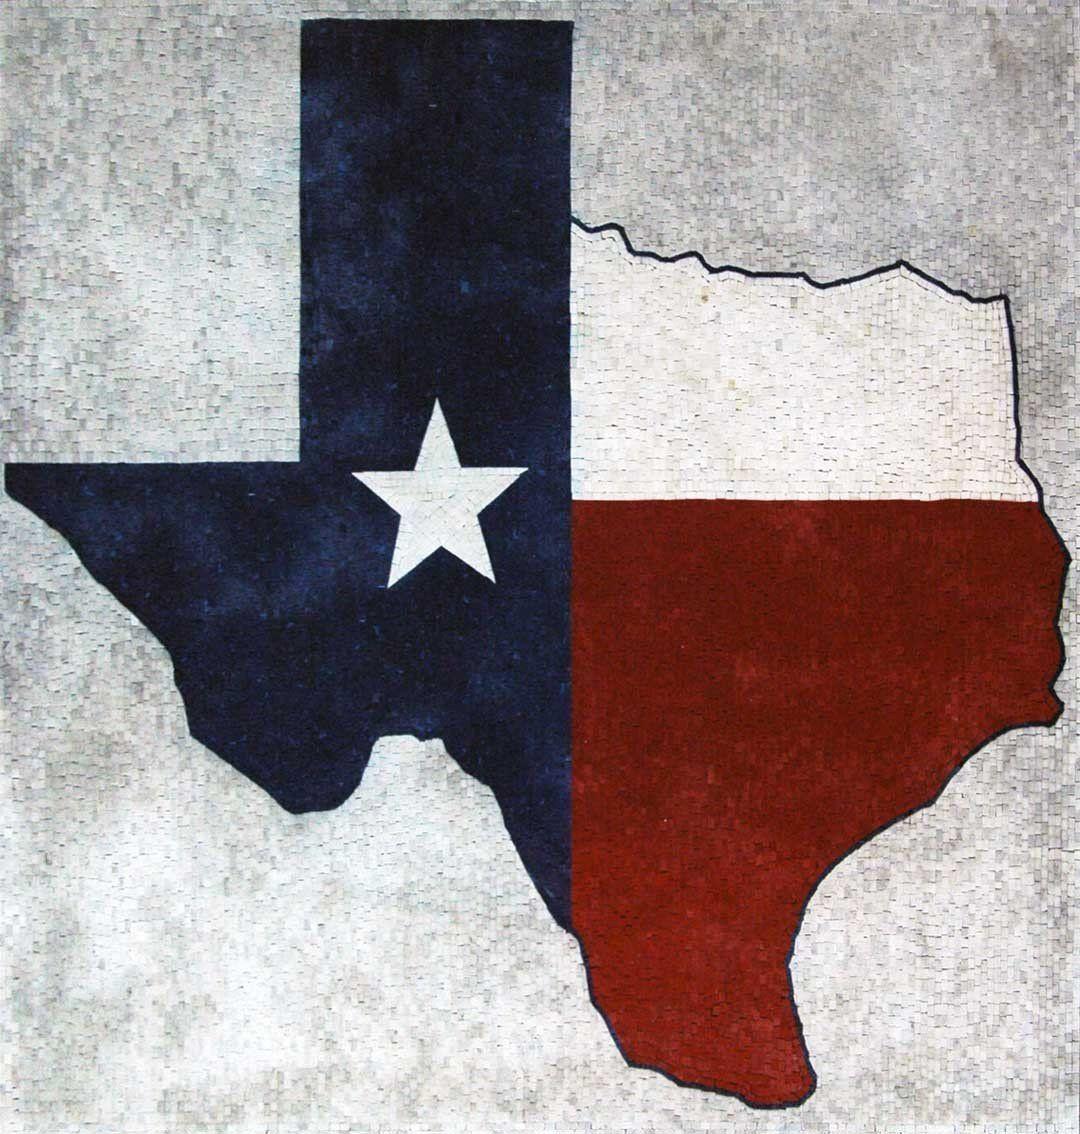 Texas Map Marble Mosaic Art In 2020 Mosaic Art Texas Art Projects Texas Map Art